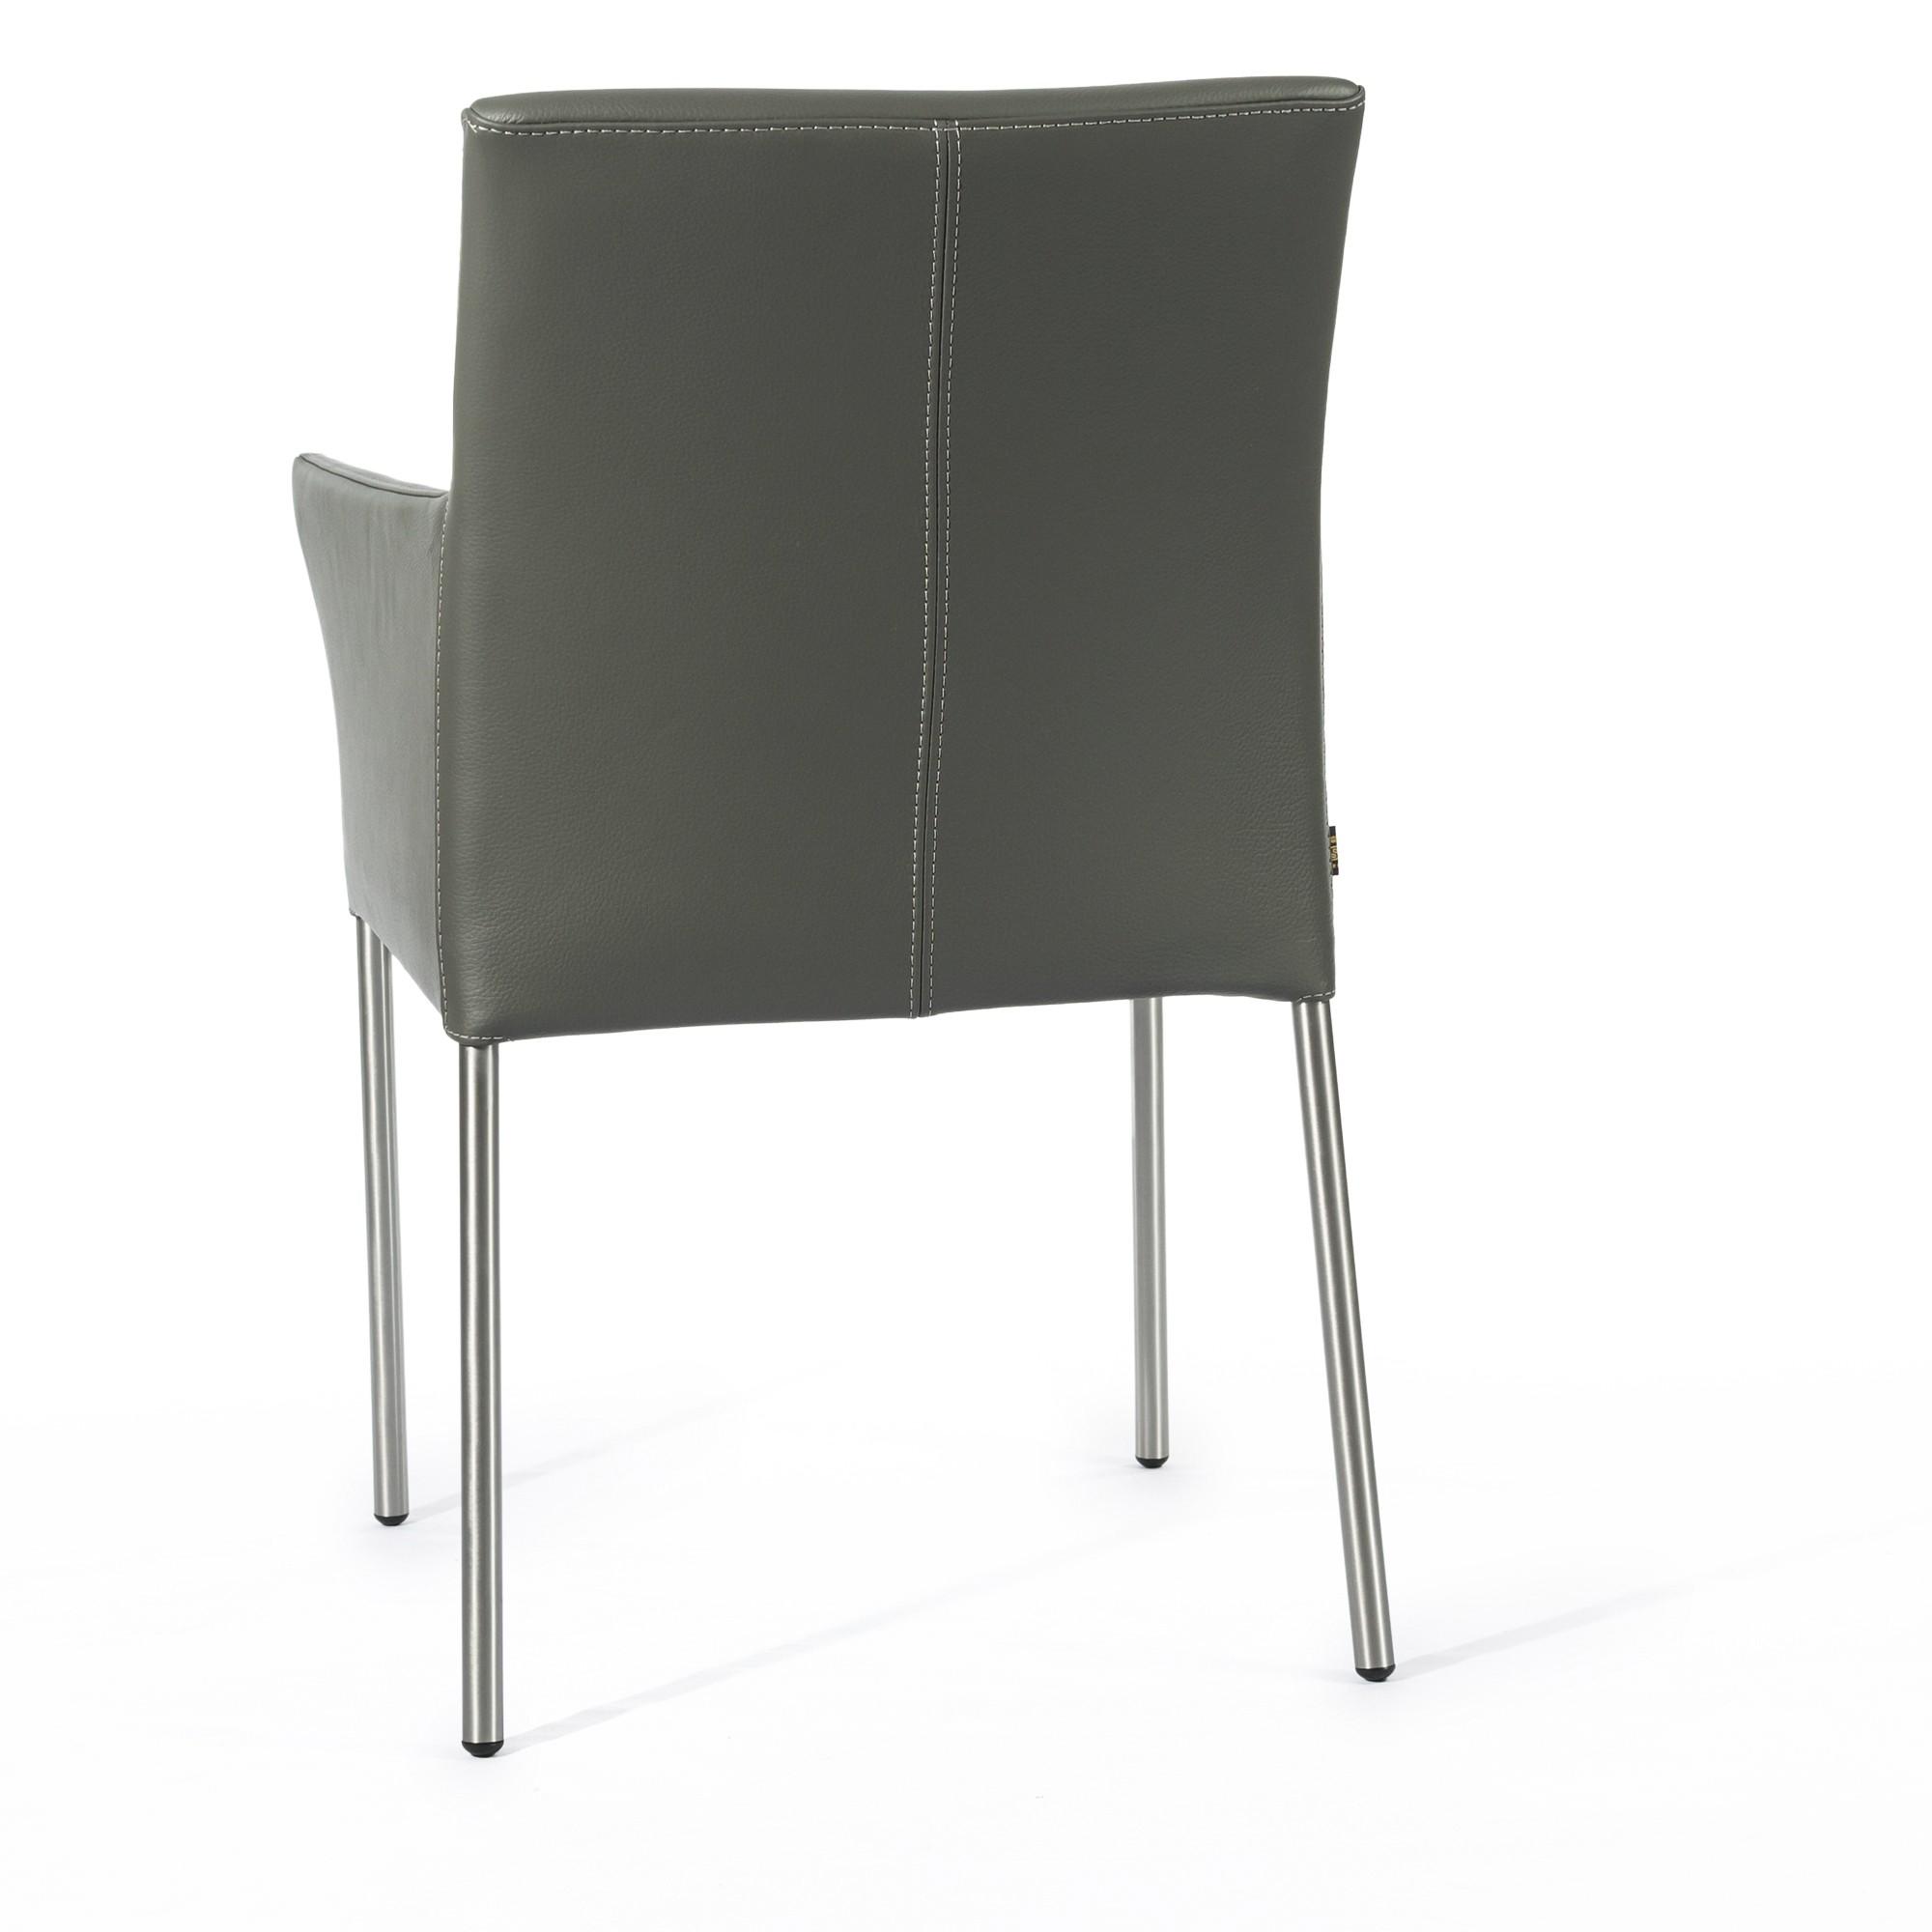 Elegant Armlehnstuhl Grau Galerie Von Lederstuhl Ledersessel Ricco – Bild 4